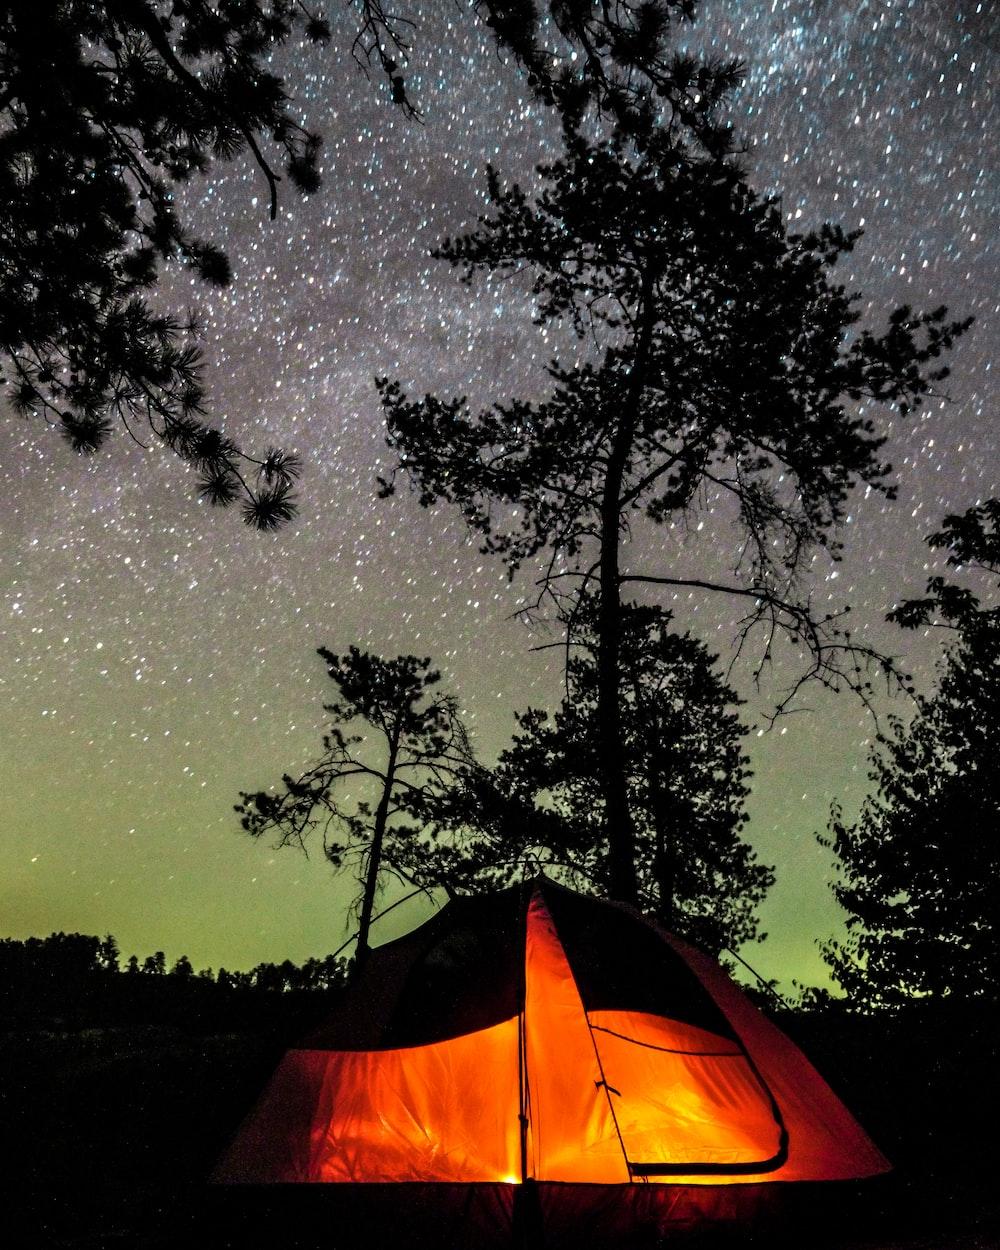 Campground at Natural Bridge